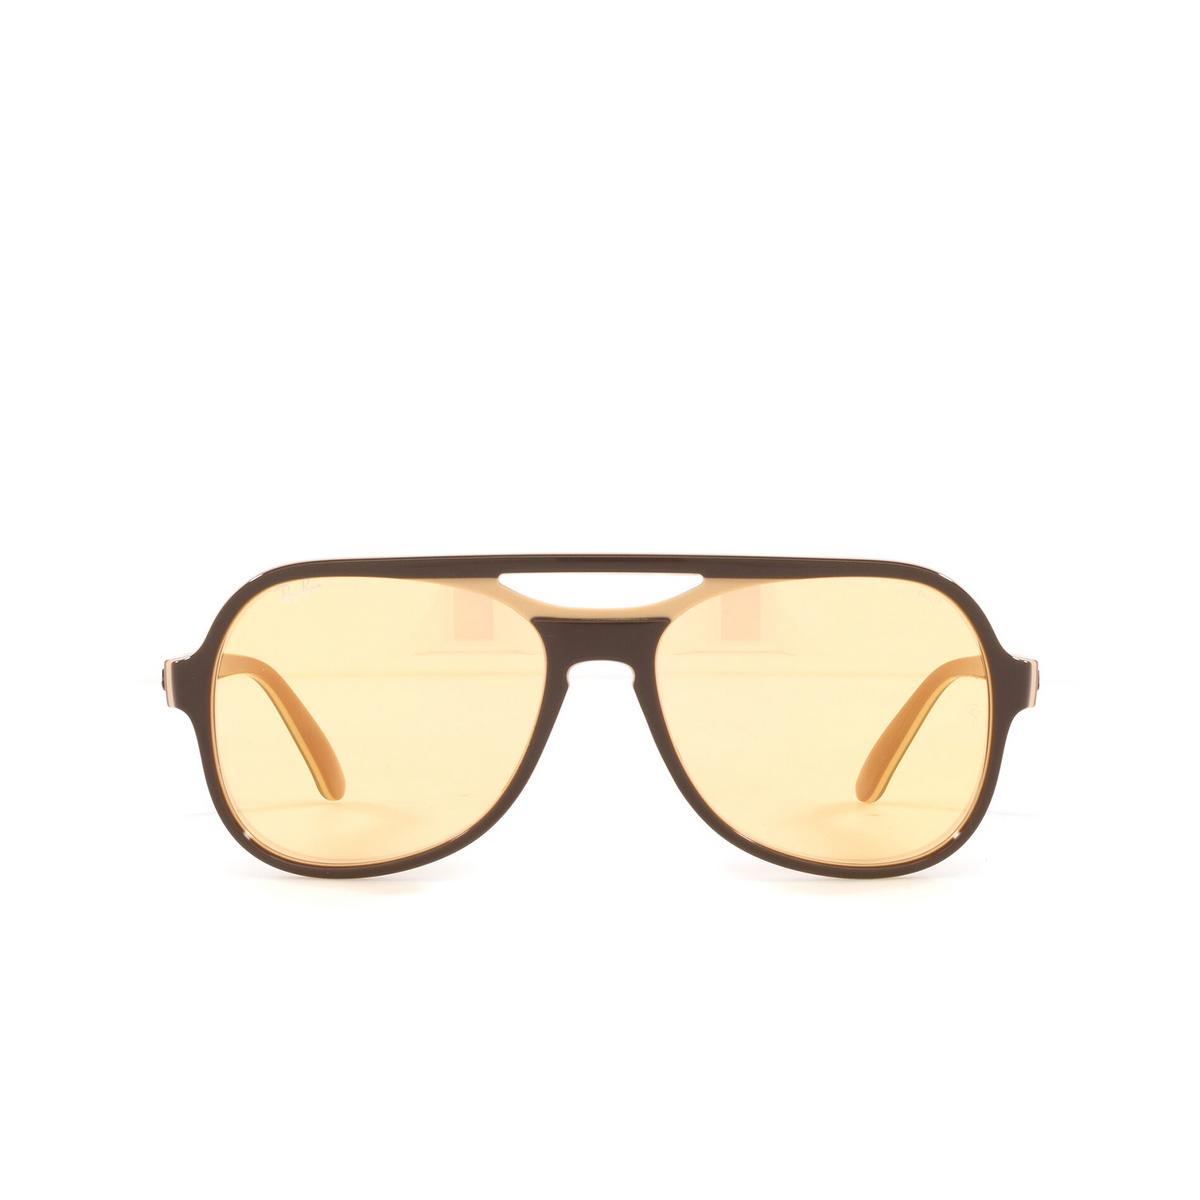 Ray-Ban® Aviator Sunglasses: Powderhorn RB4357 color Dark Brown Light Brown 6547B4 - front view.